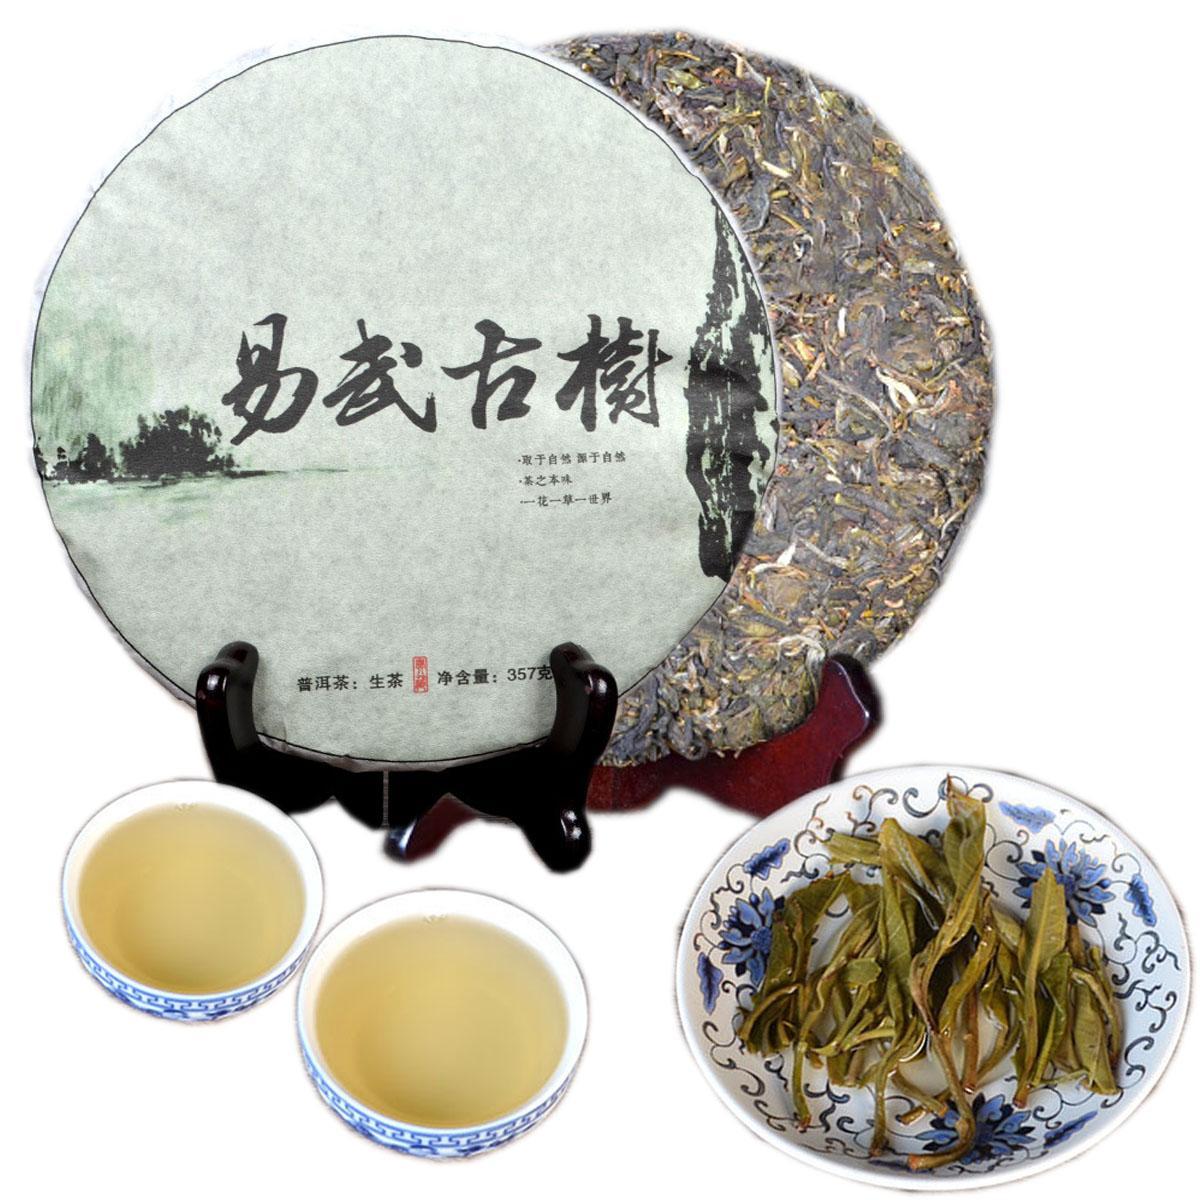 Raw Puerh thé 357 g Yunnan Yiwu arbre ancien Puer thé Pu'er organique plus vieil arbre vert Pu'er Gâteau Puerh Thé naturel